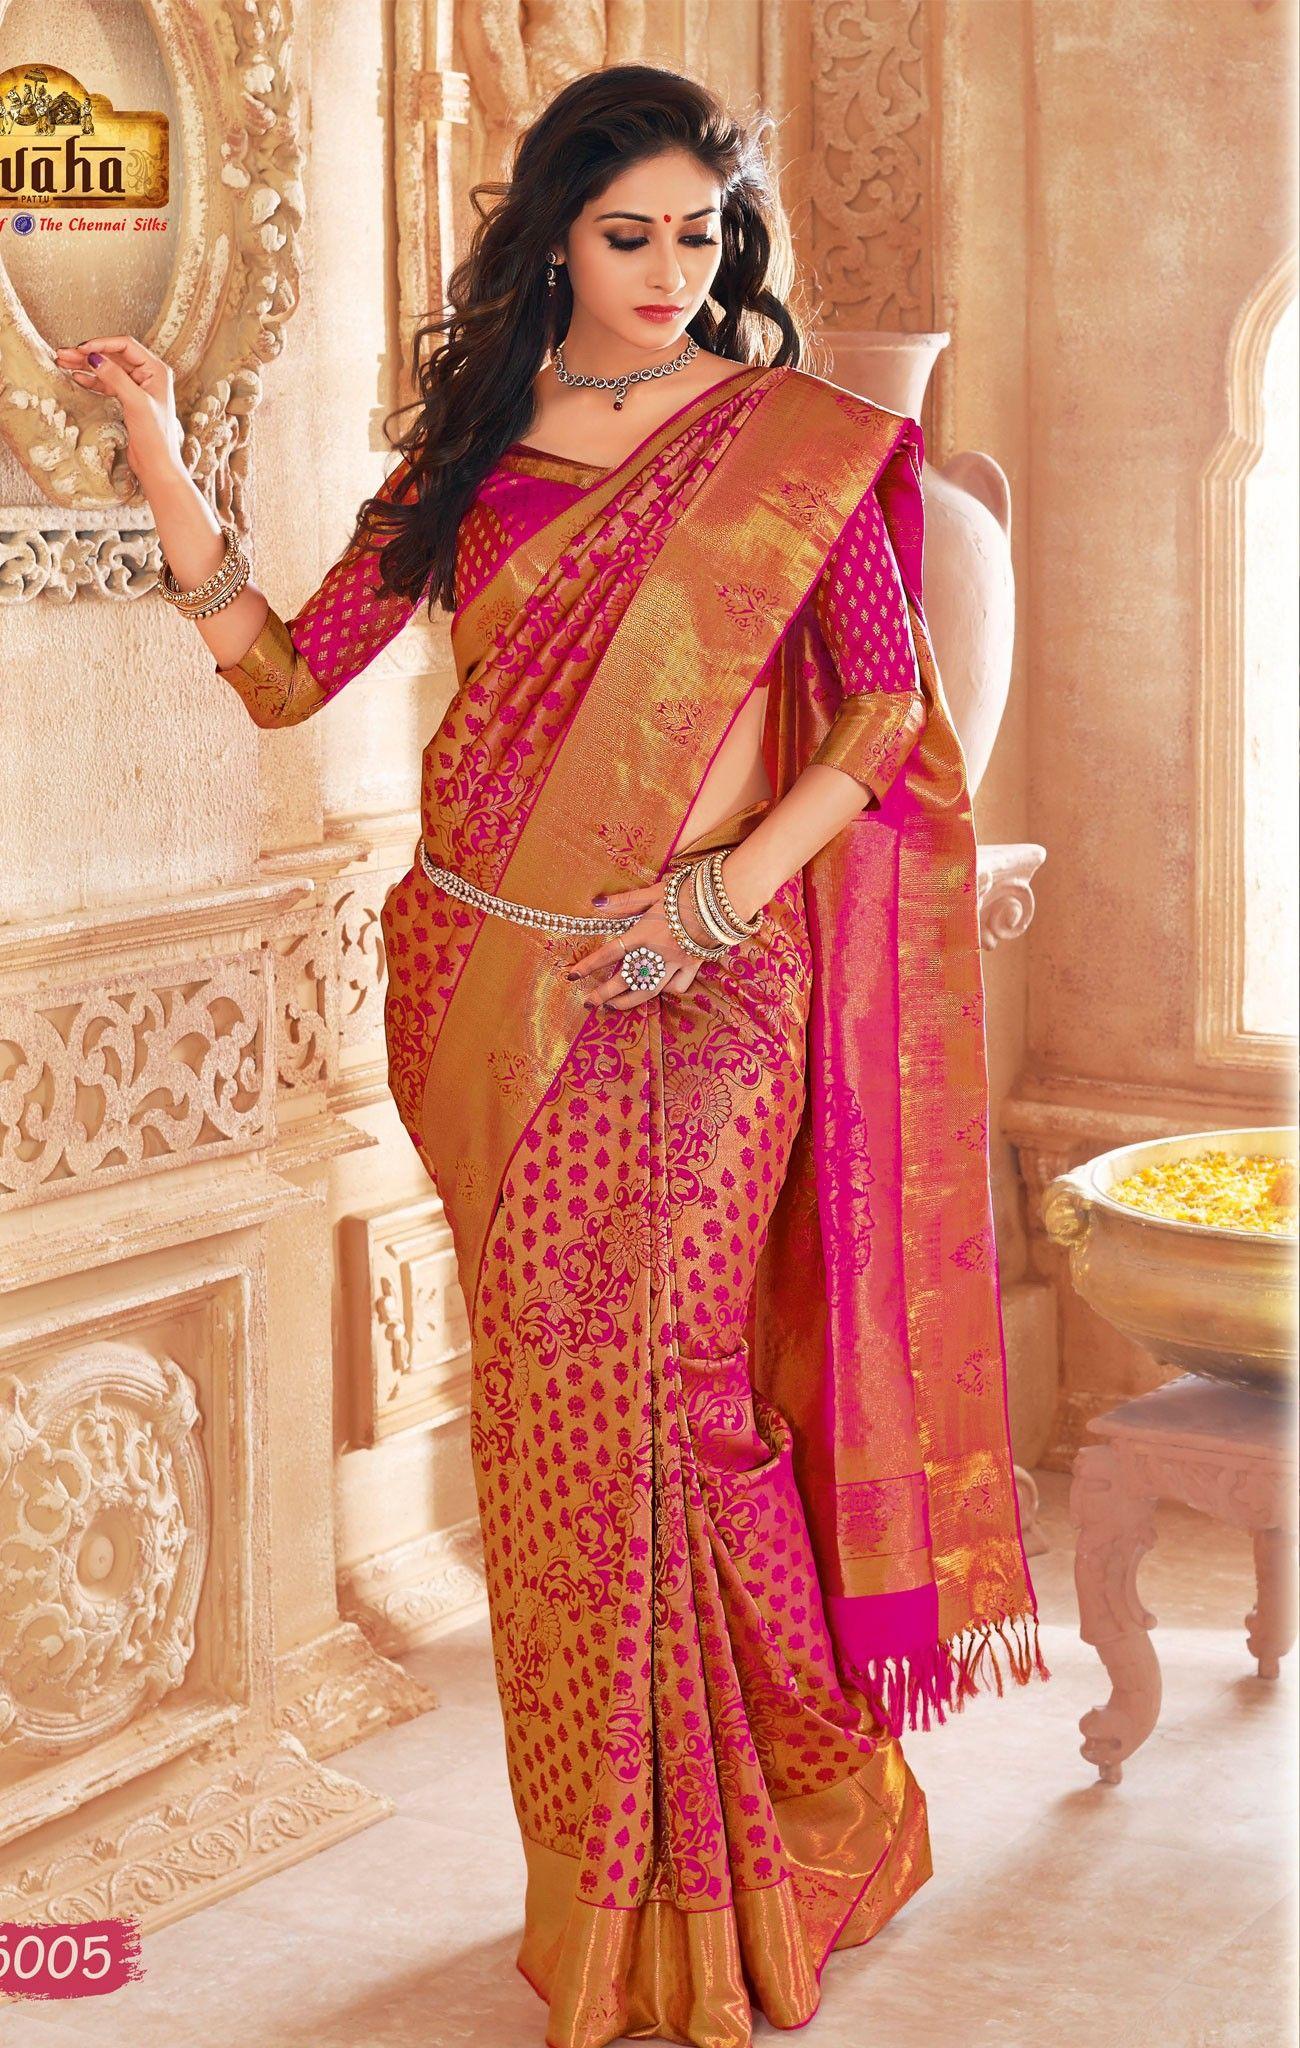 Vivaha Branded Wedding Silk Saree Vbbs5005 Saree Designs Party Wear Sarees Designer Silk Sarees